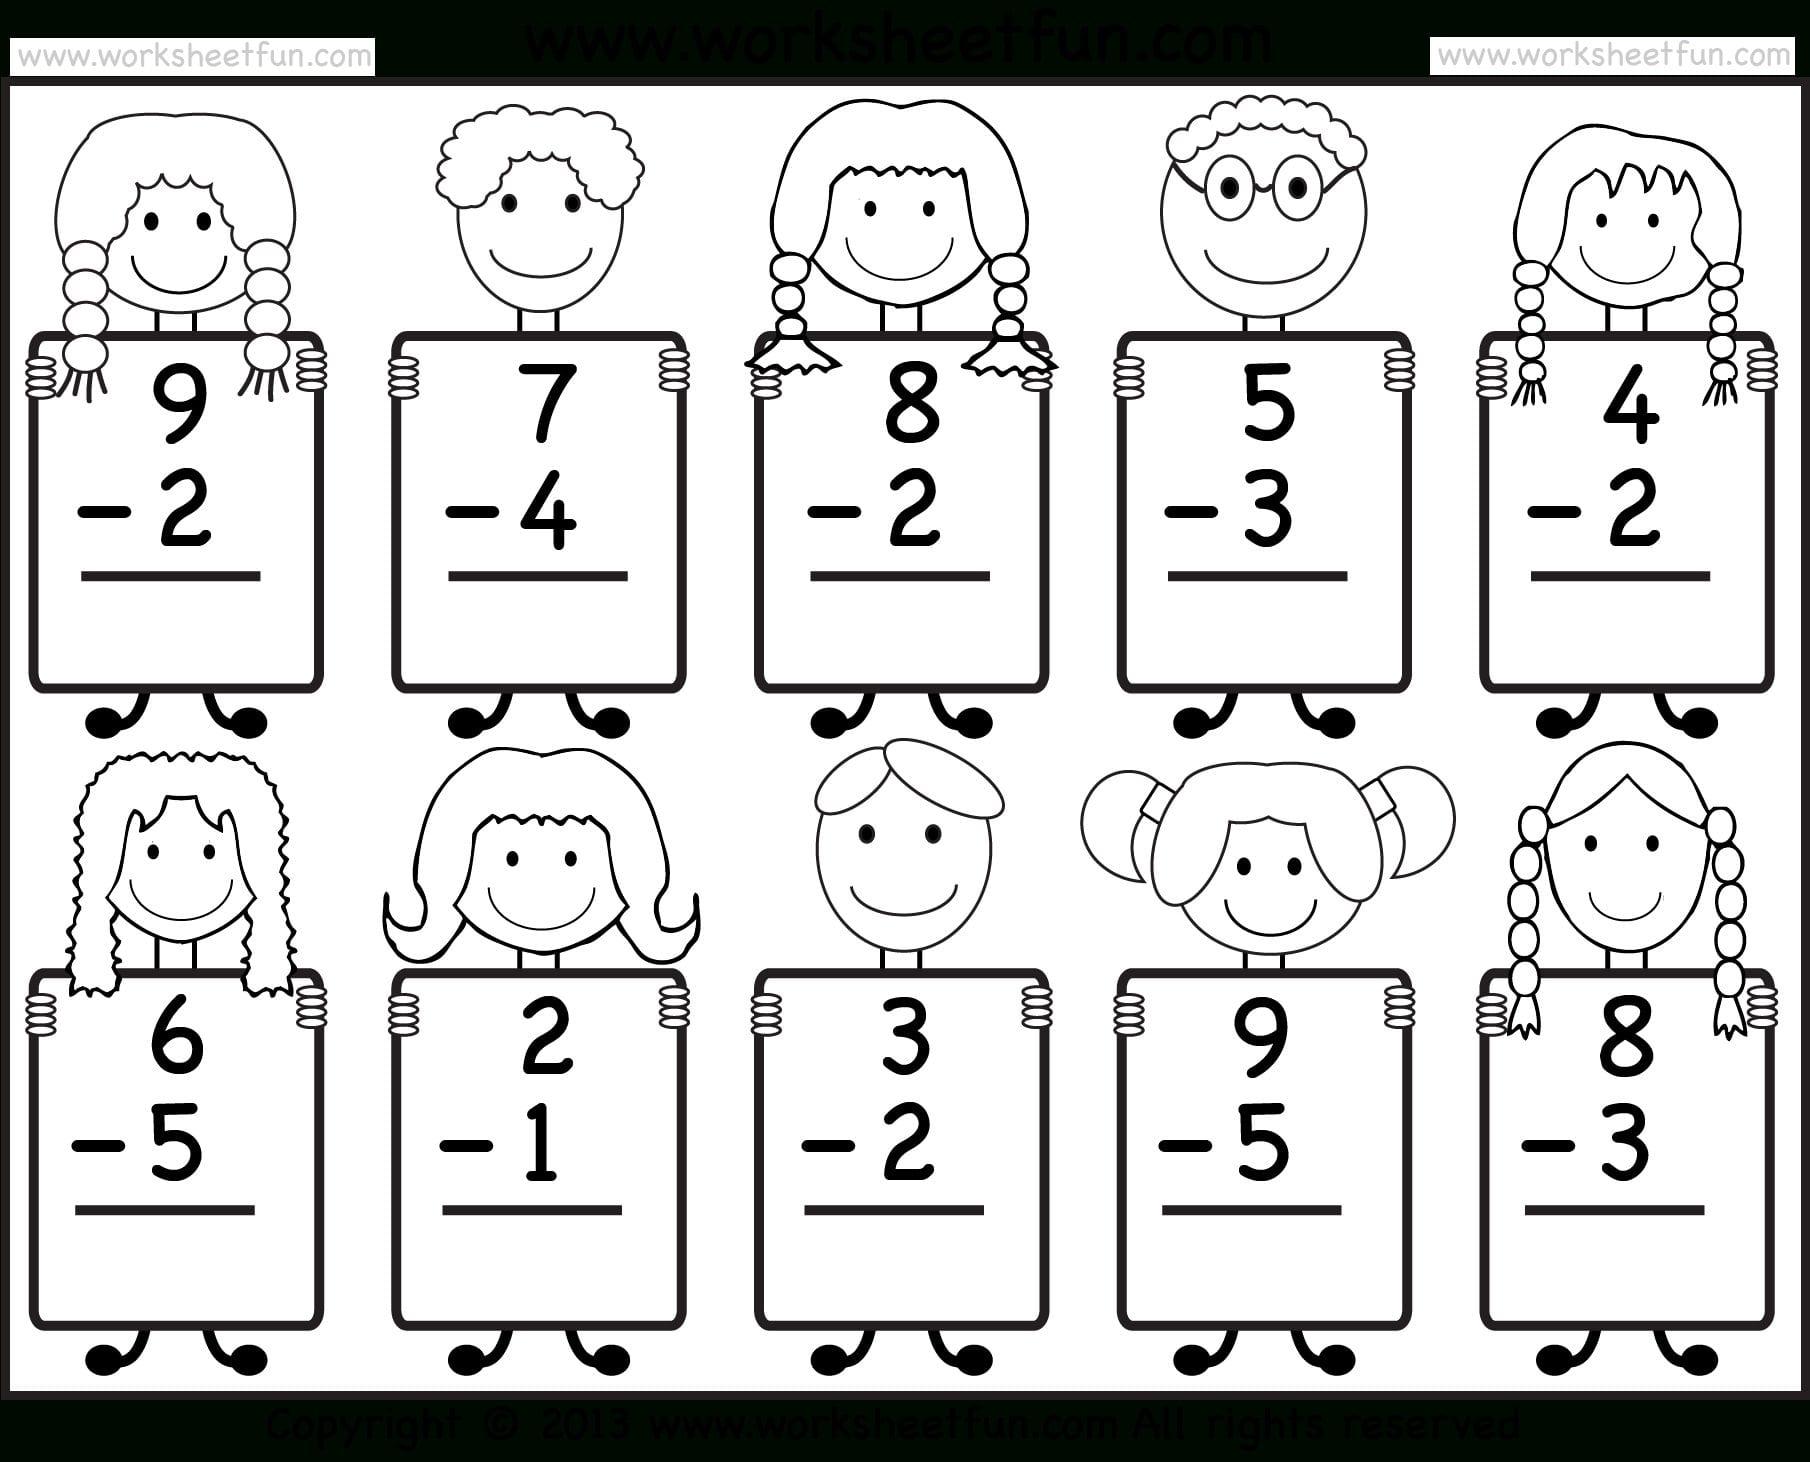 Beginner Subtraction – 10 Kindergarten Subtraction Worksheets  Free For Addition And Subtraction Worksheets For Kindergarten